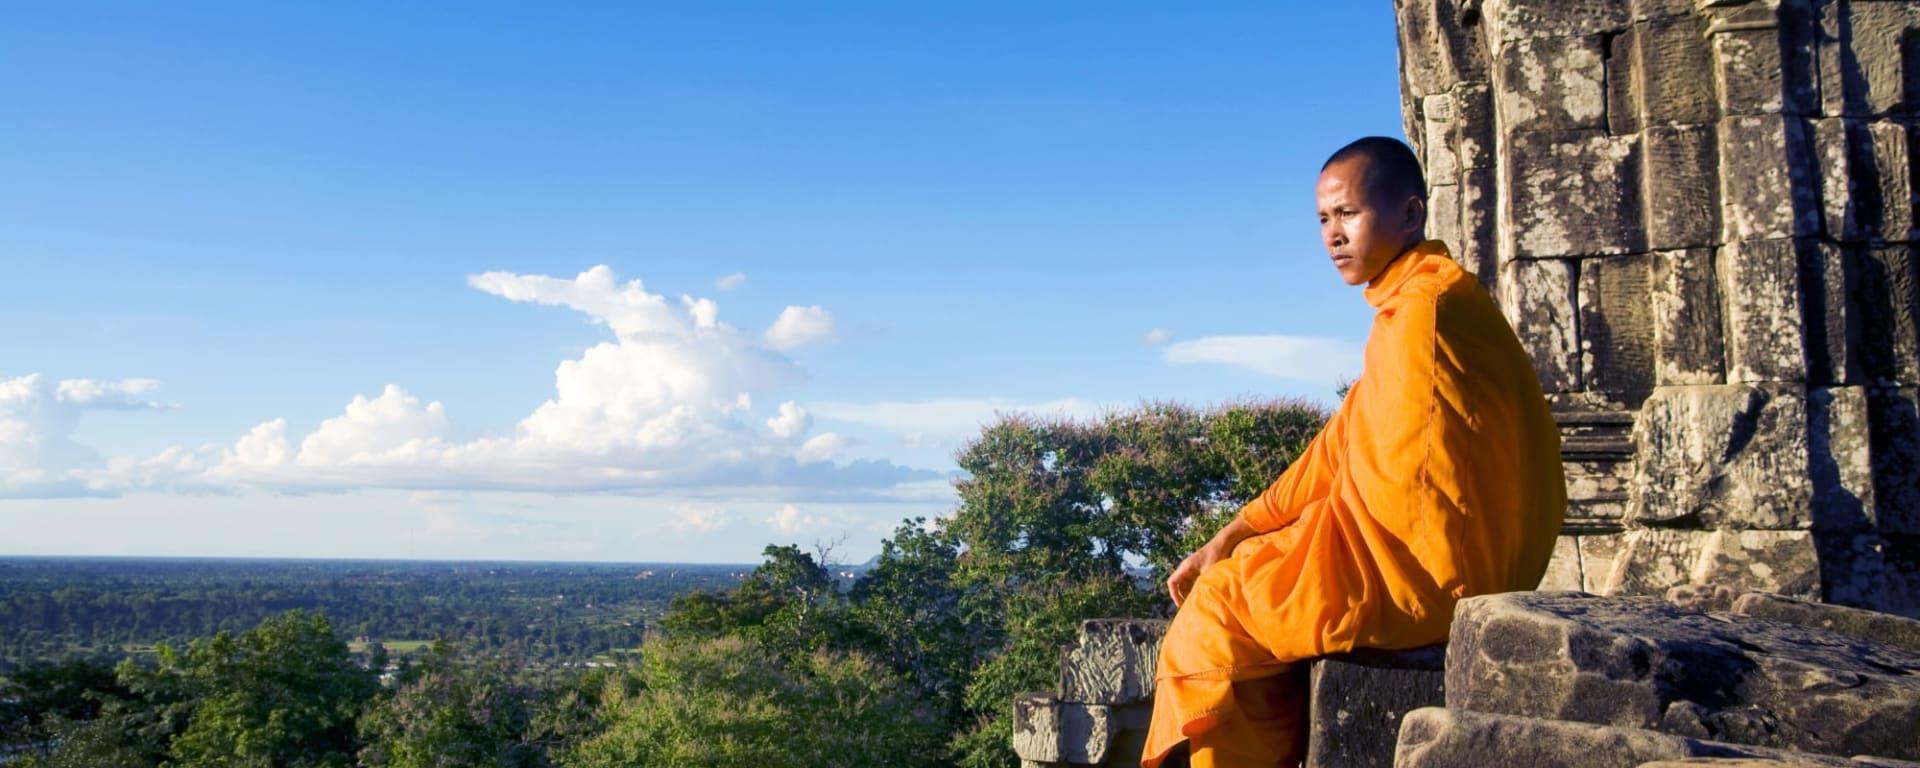 Angkor Wat, DE, Halbtägig in Siem Reap: Kambodscha Siem Reap Angkor Wat Moench